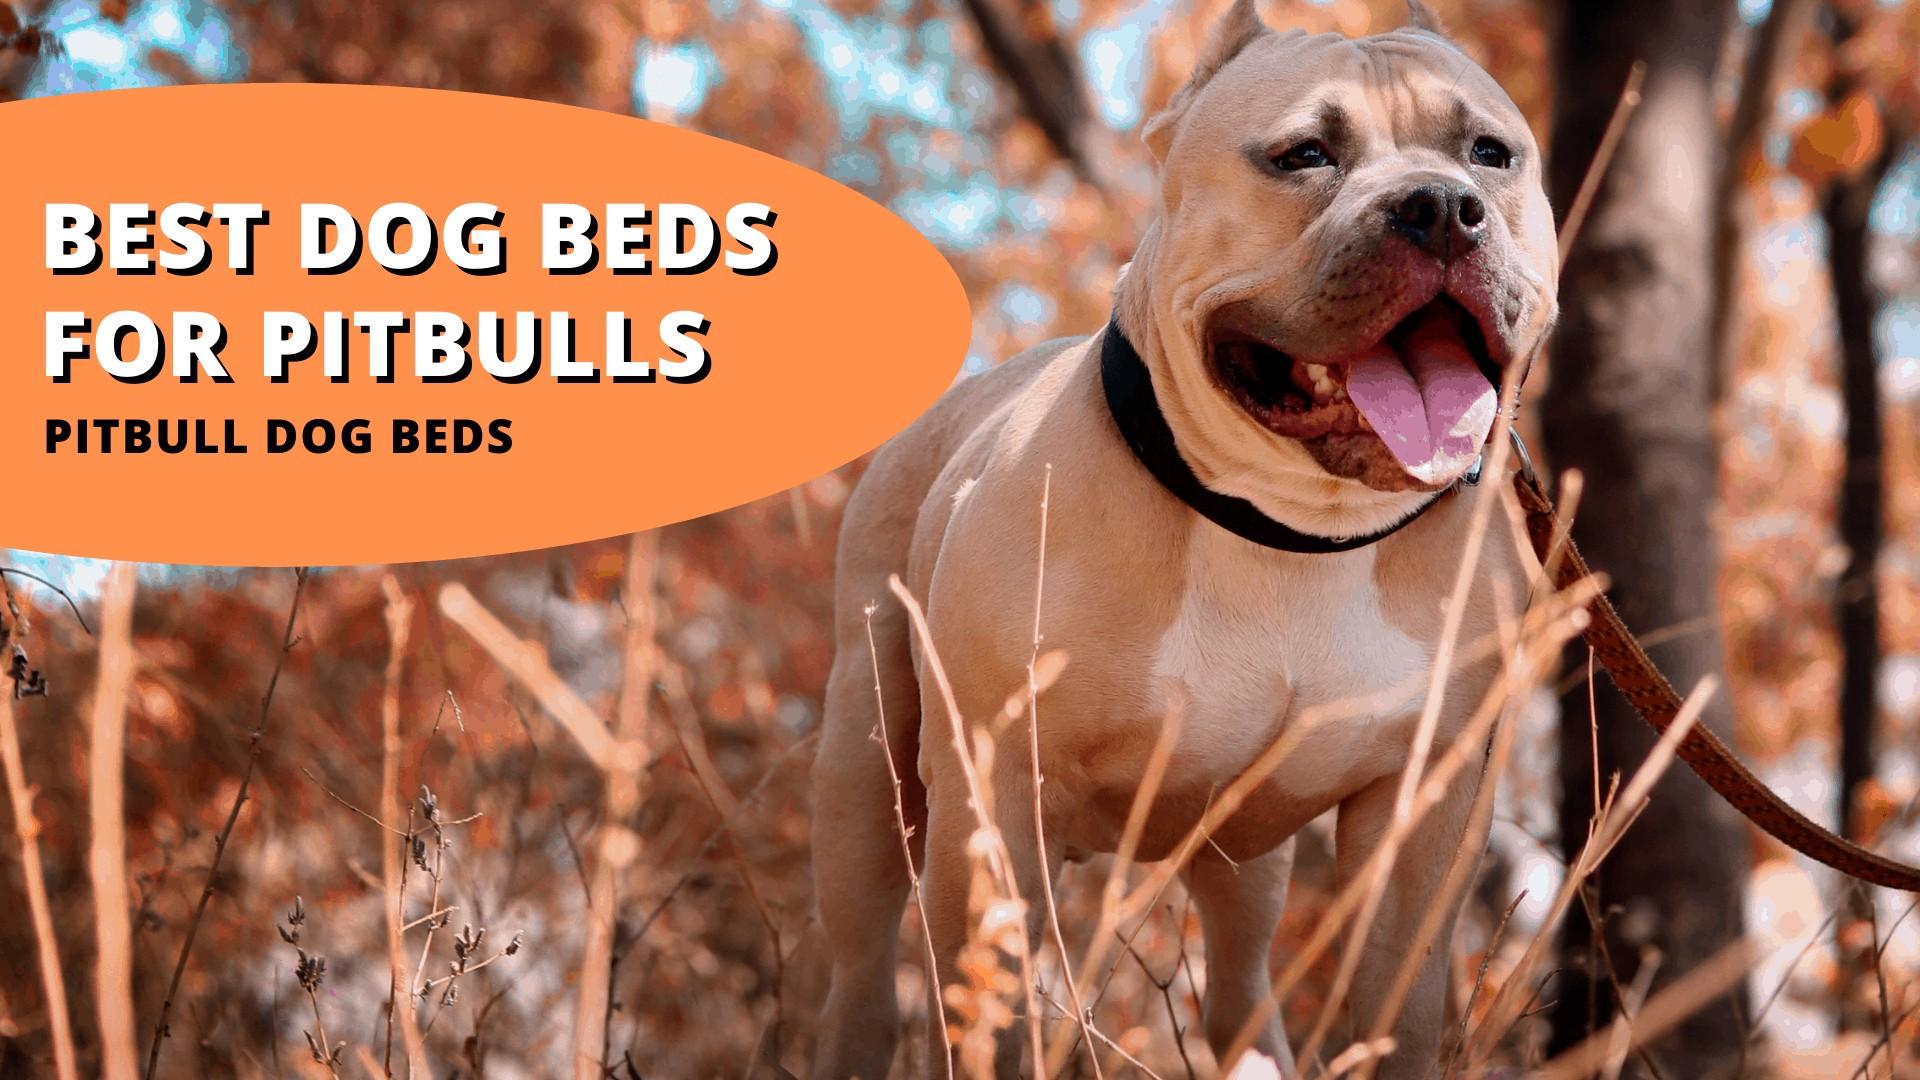 Best dog beds for pitbulls